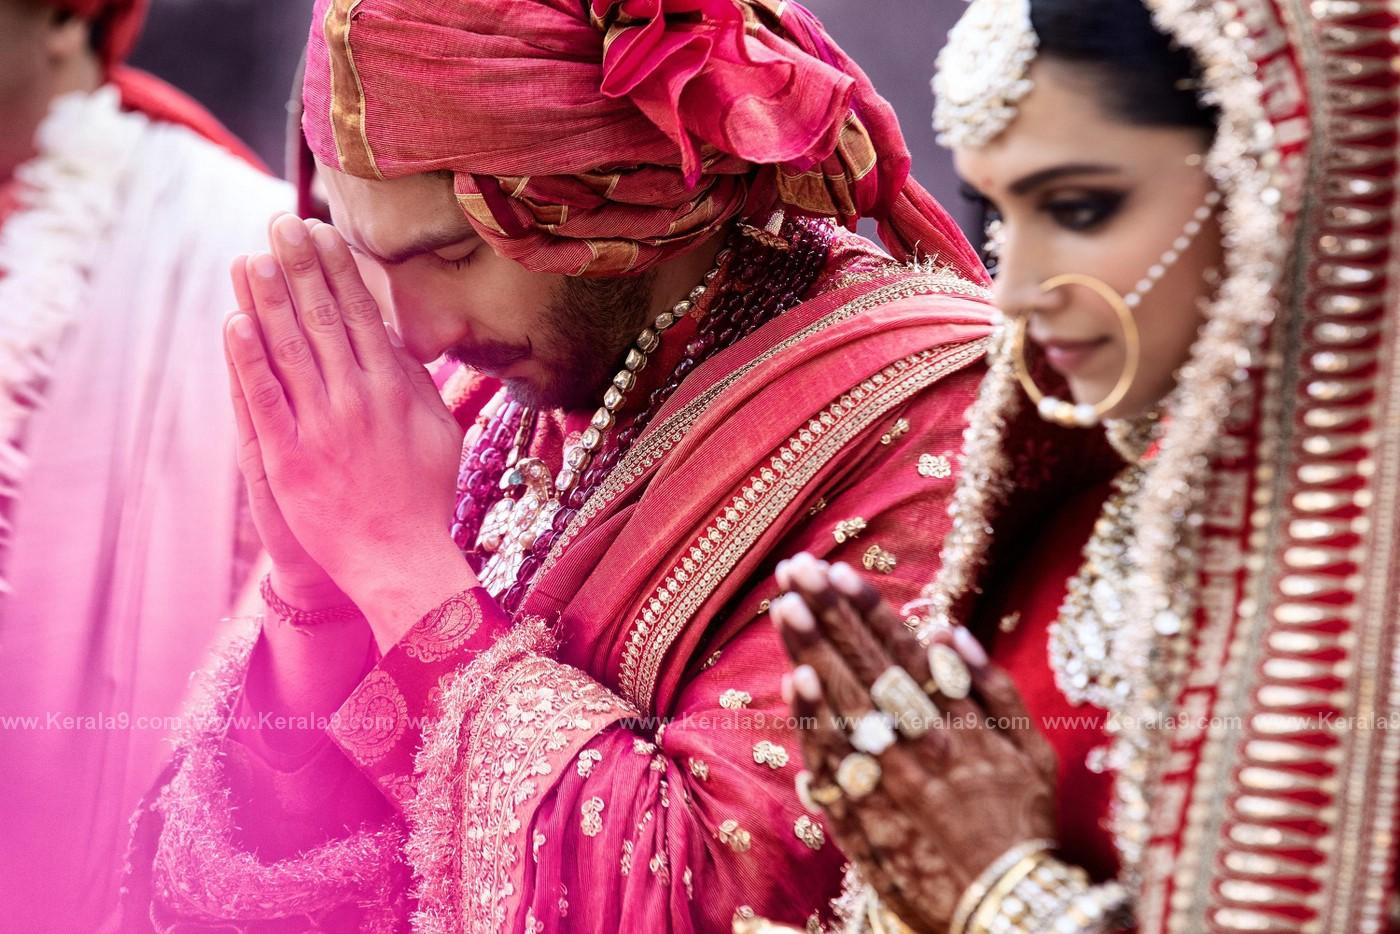 deepika padukone wedding pics 0992 1